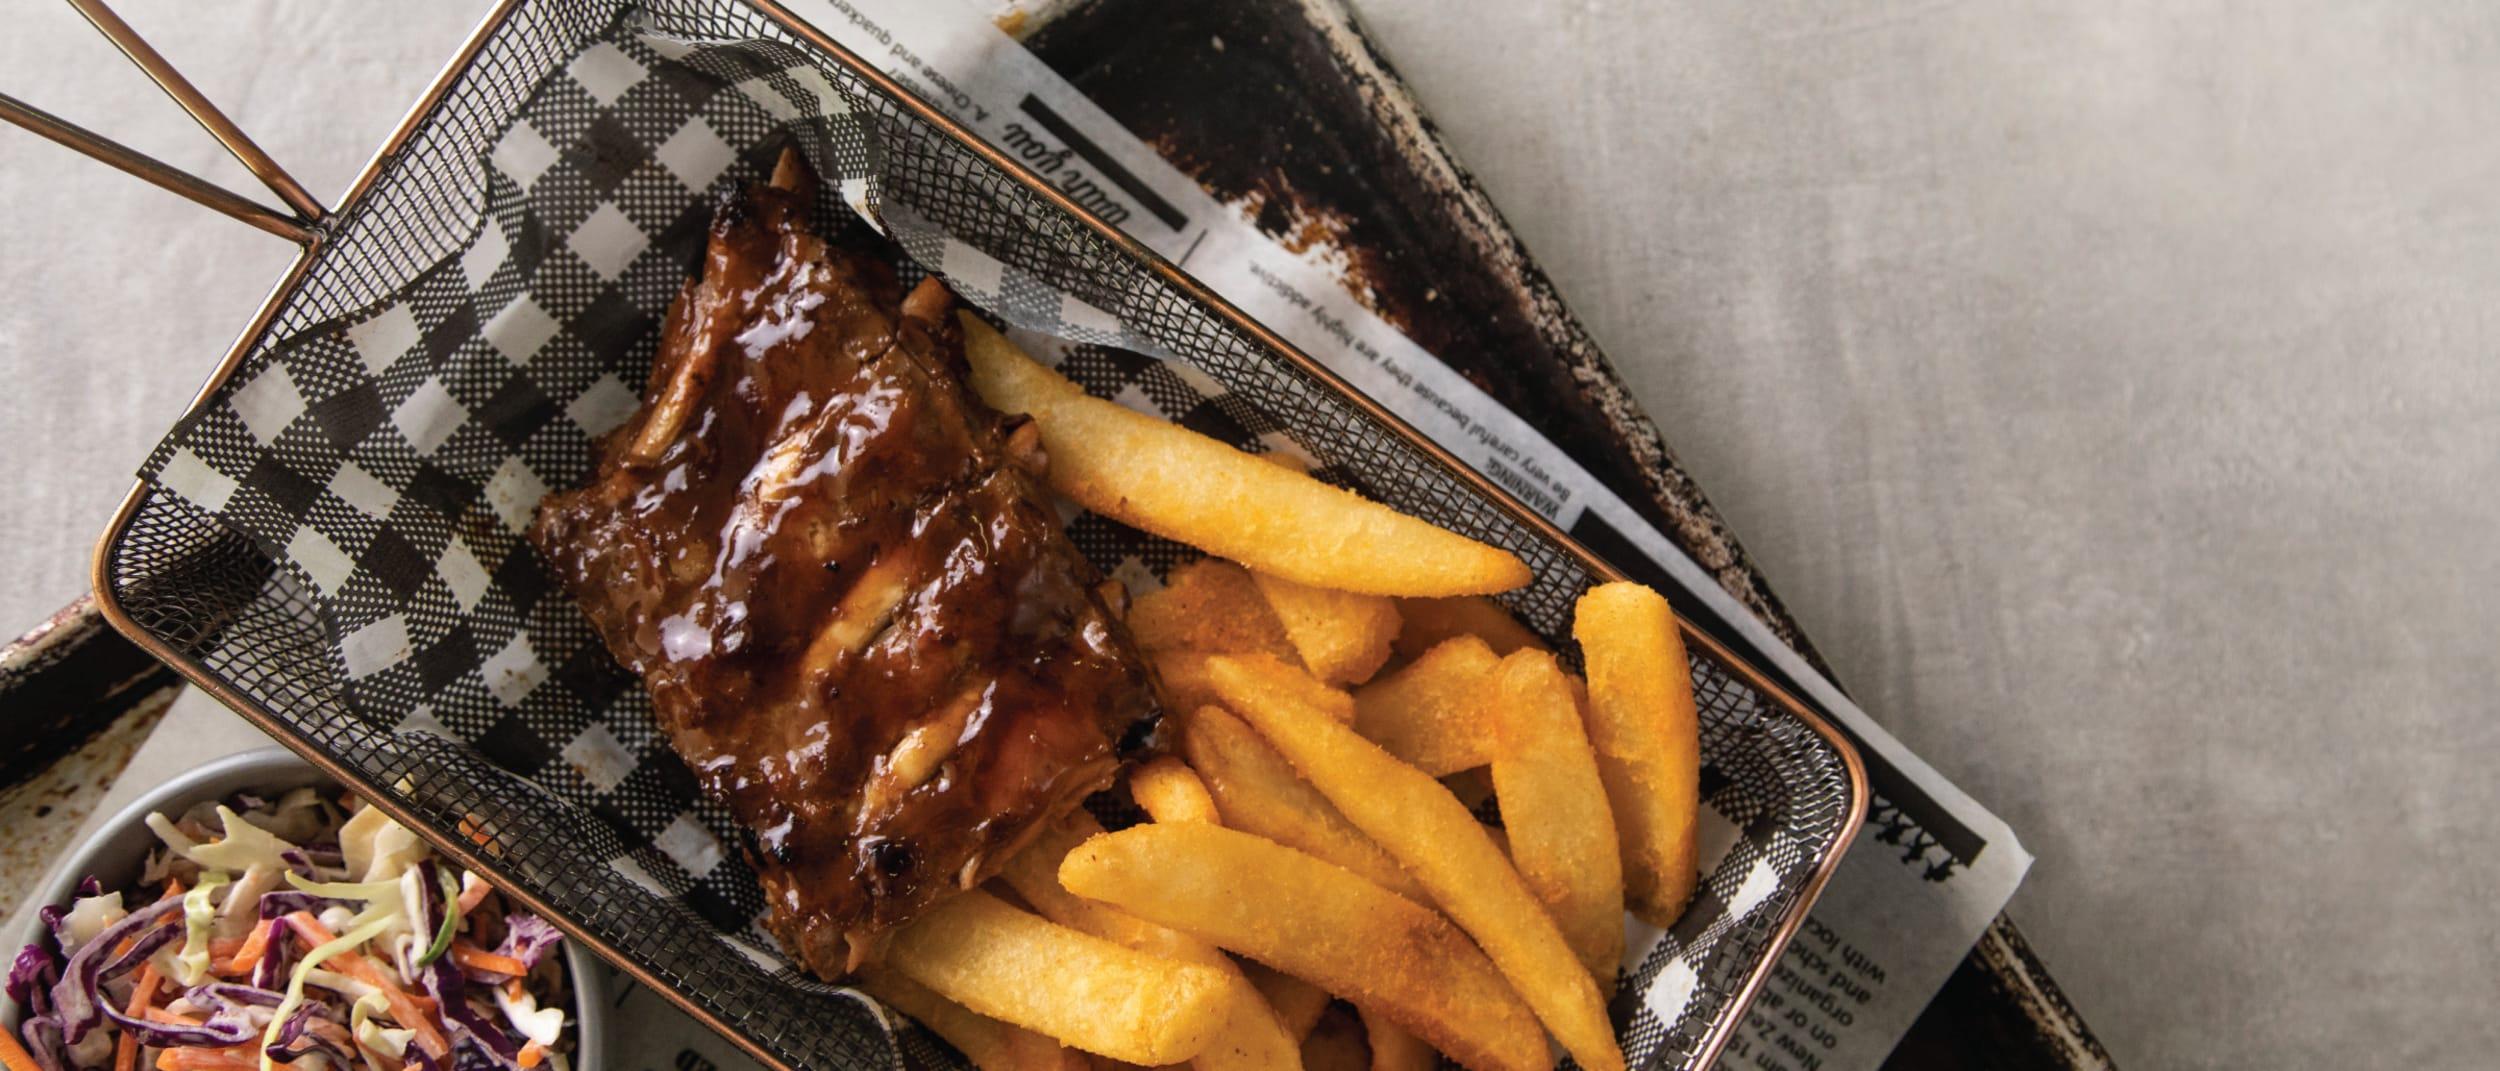 Bucking Bull's NEW Smoky BBQ Pork Ribs